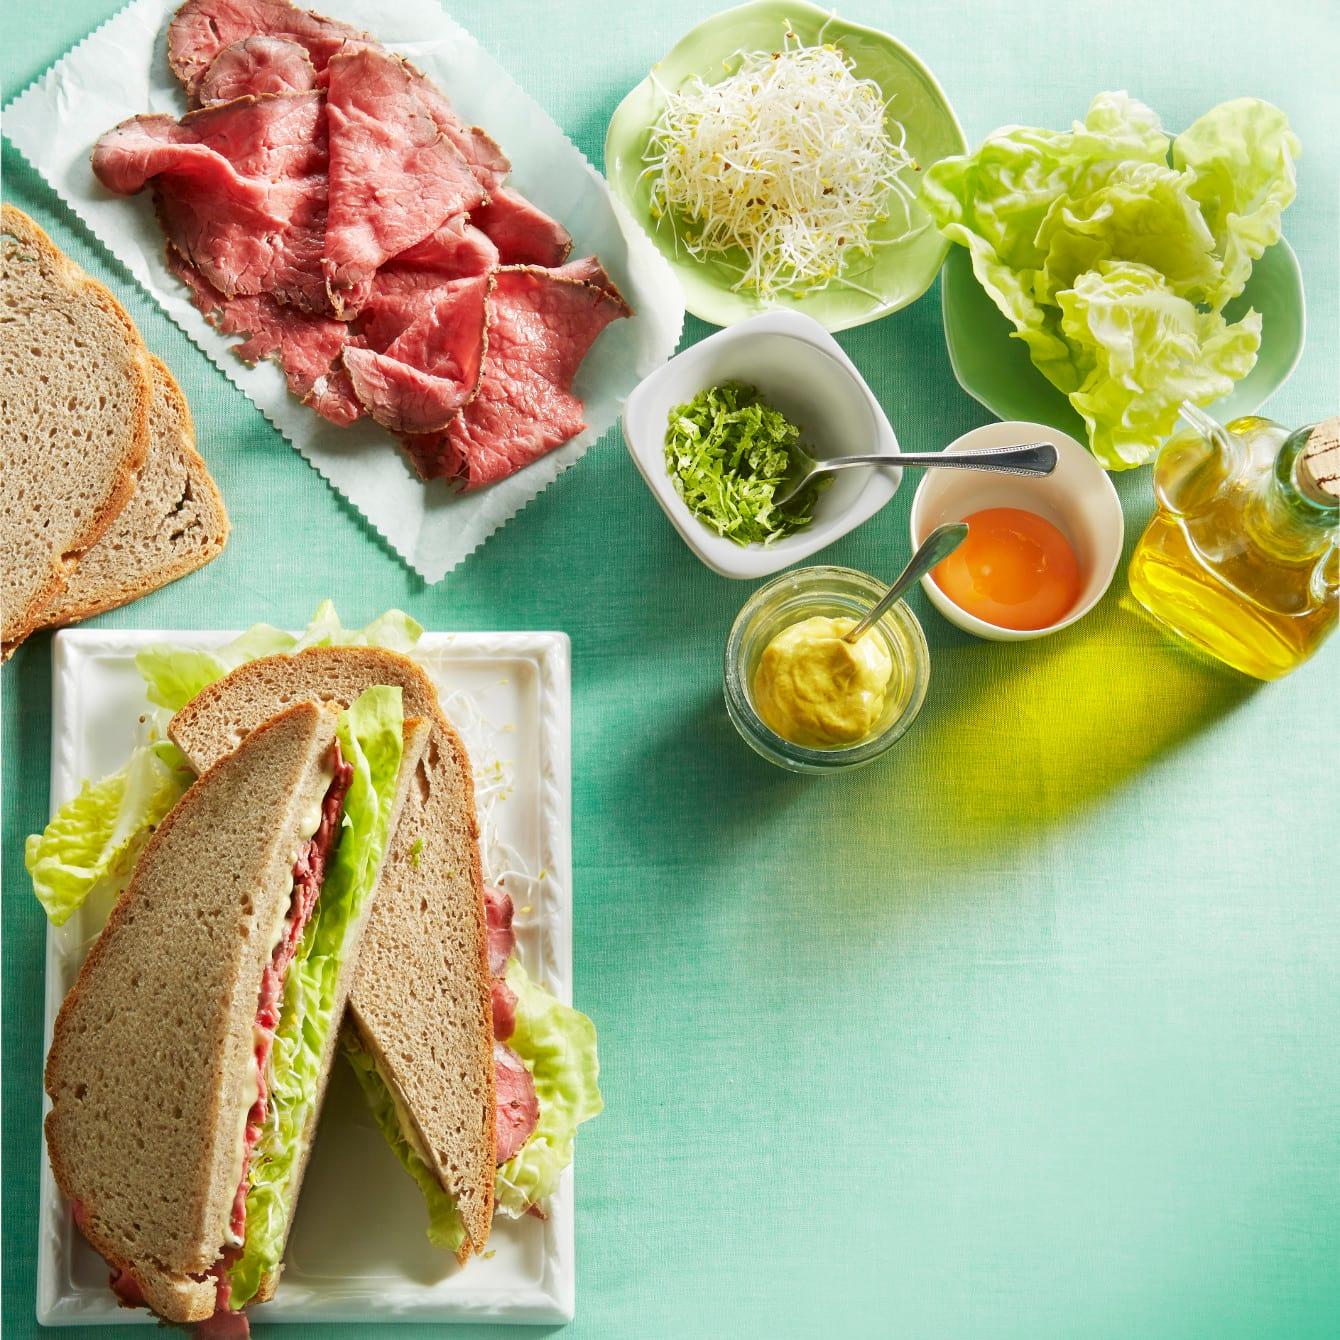 Rosbiefsandwich met limoenmayonaise